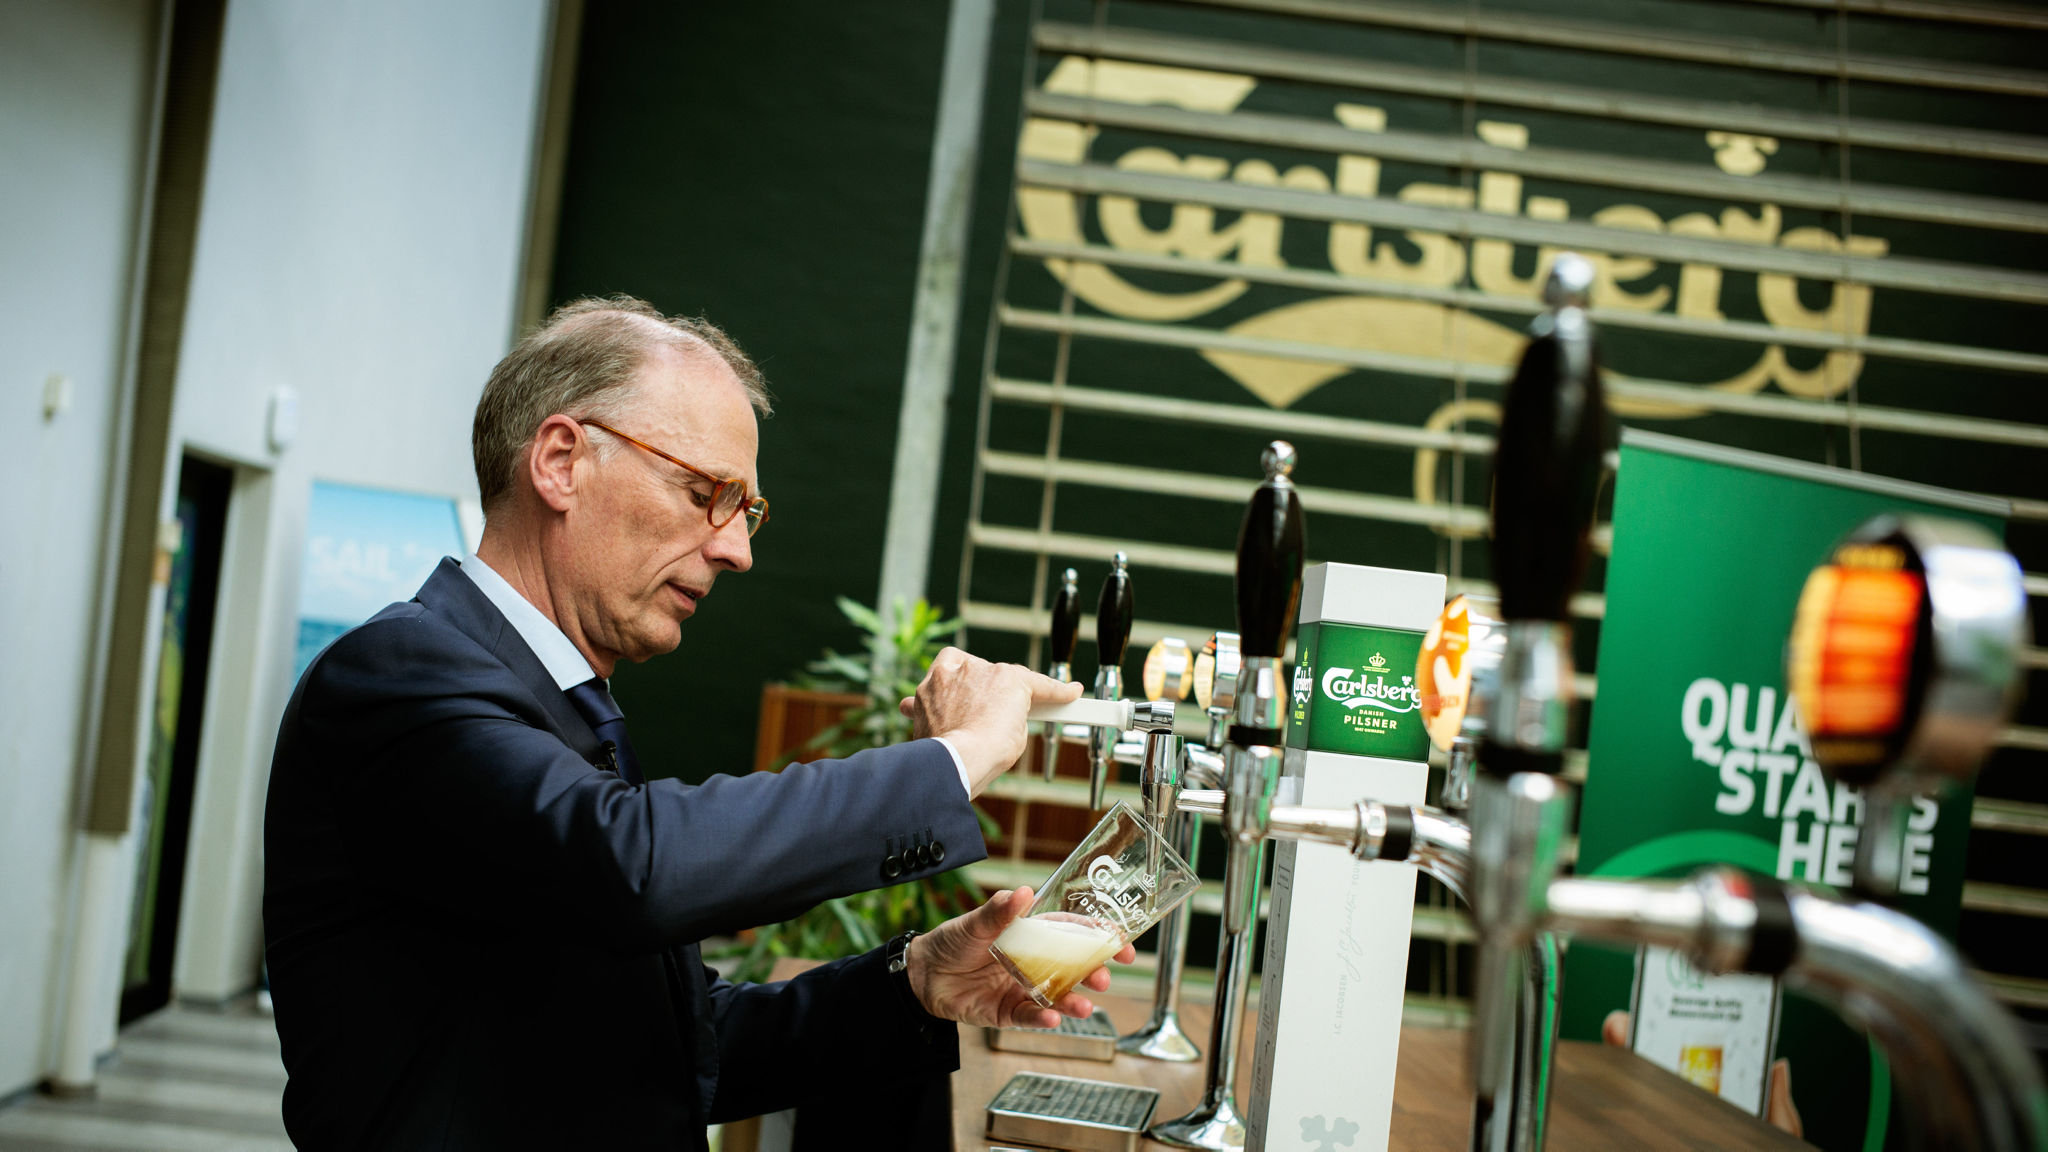 Carlsberg cheers investors as it raises profit guidance